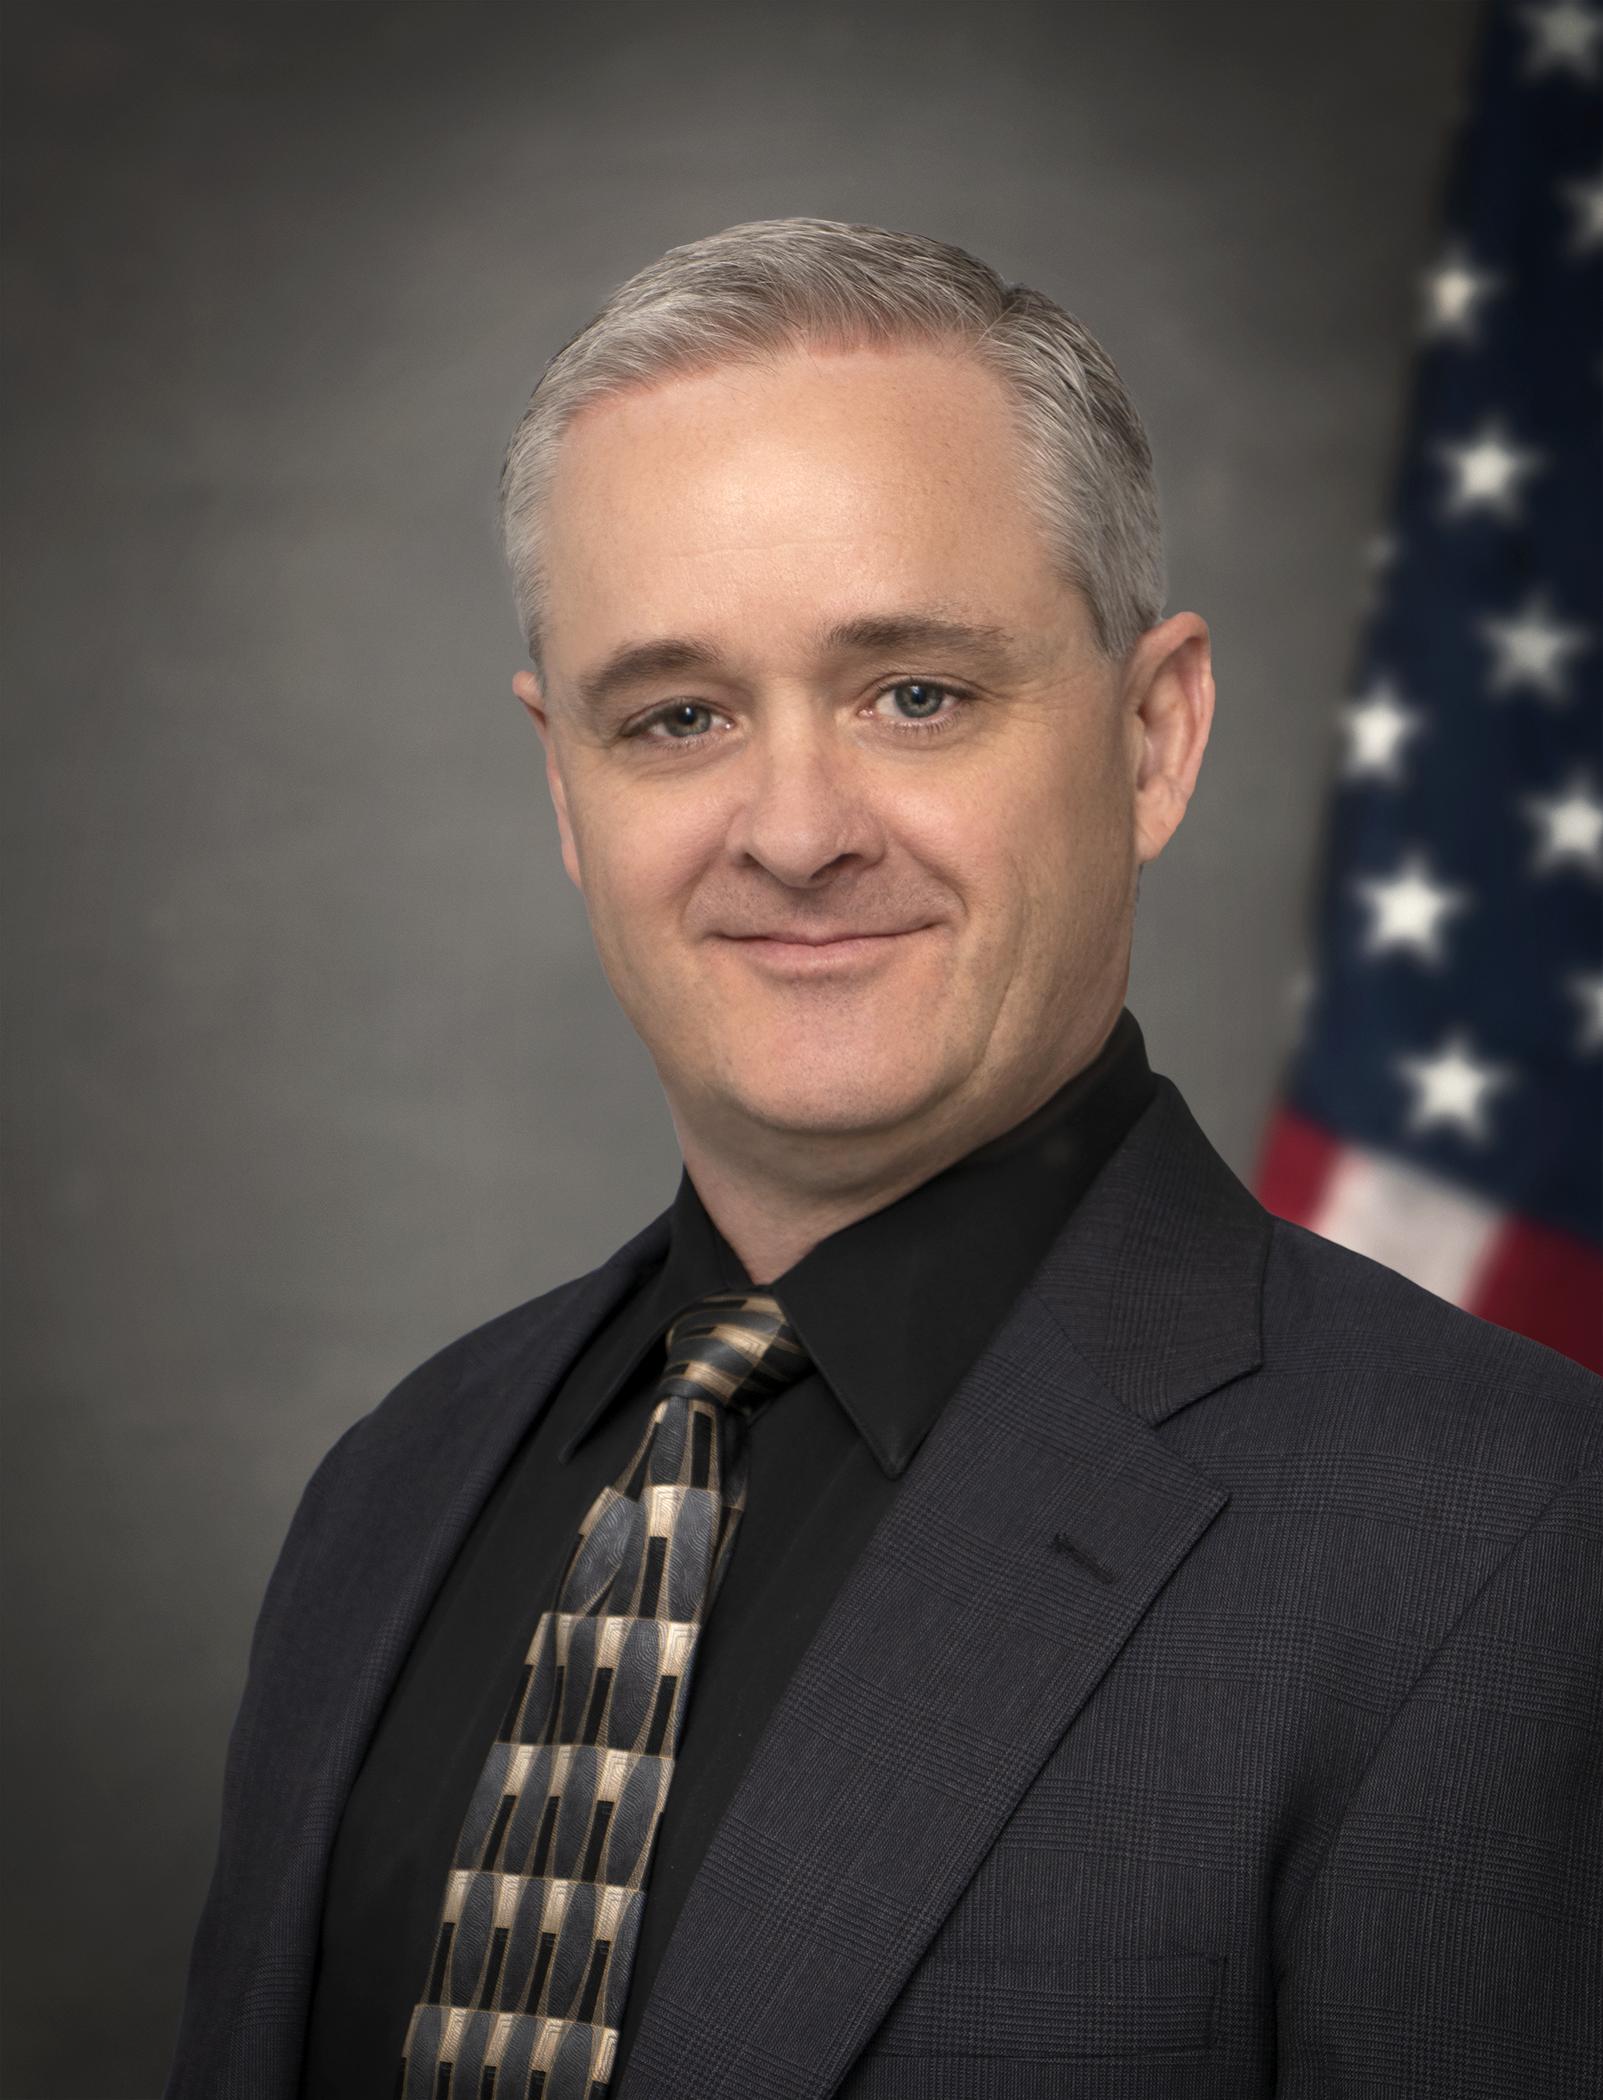 Deputy Director Jon Savary